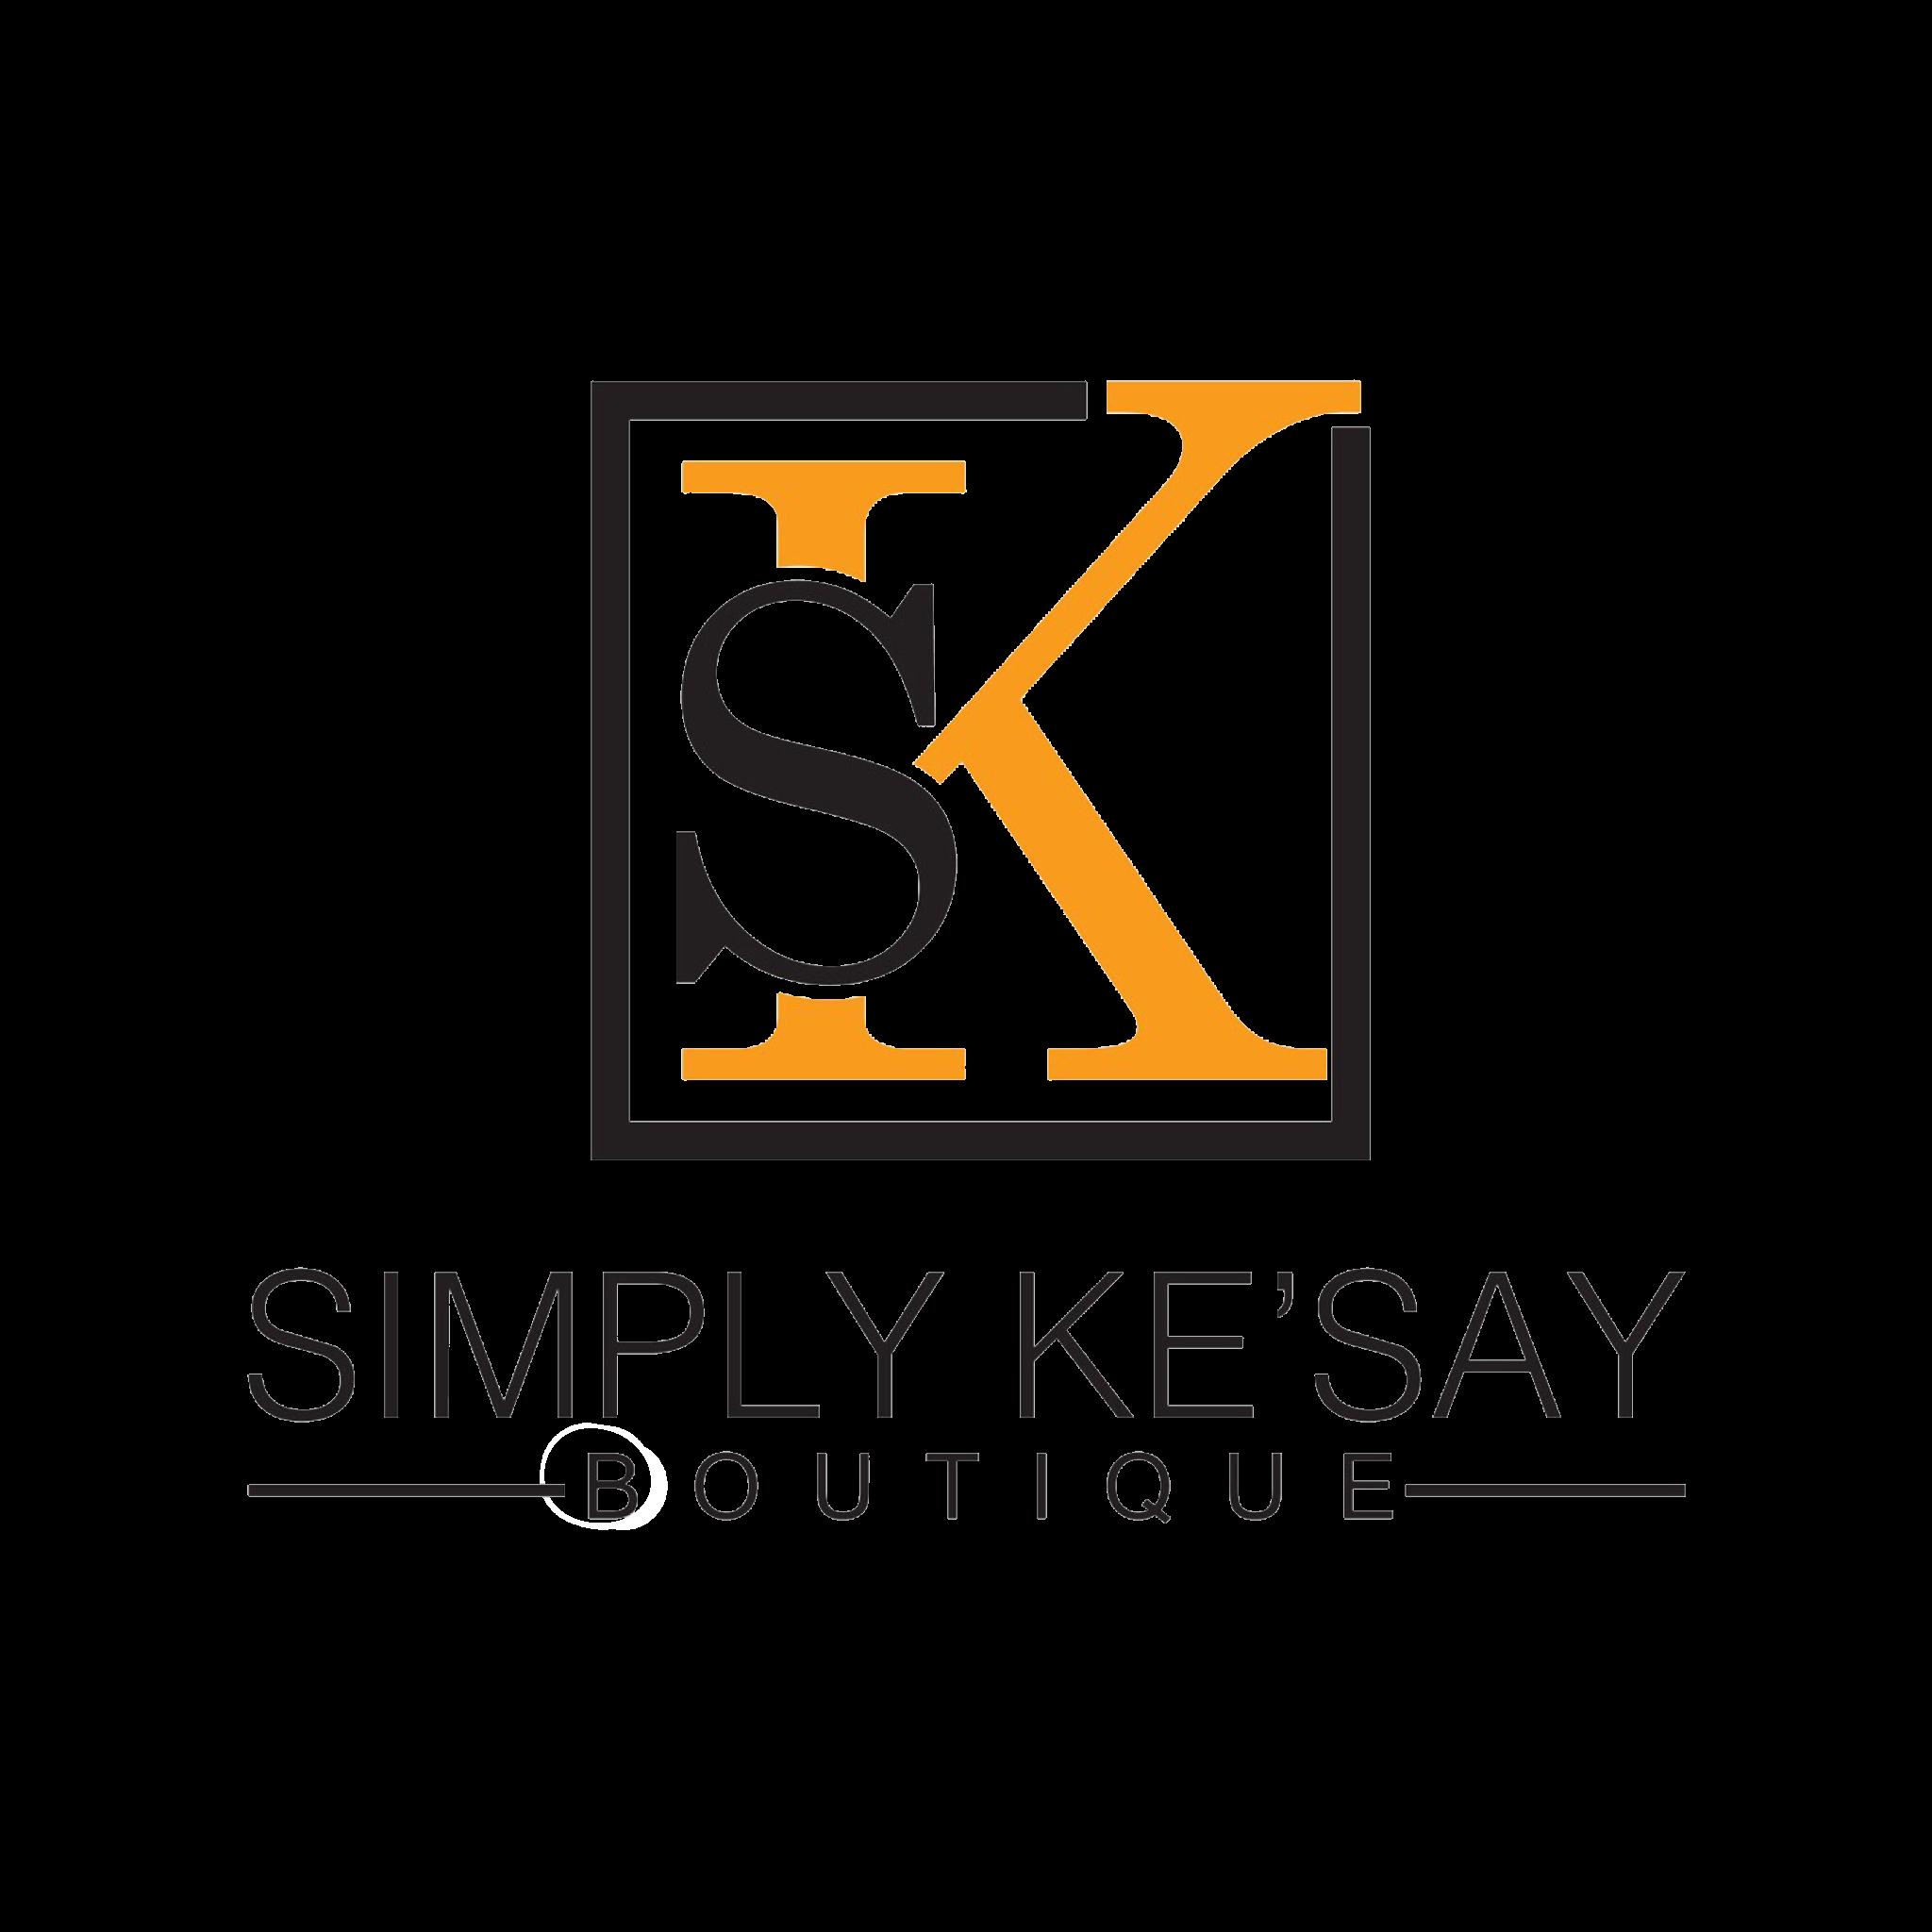 Simply Ke'Say Boutique